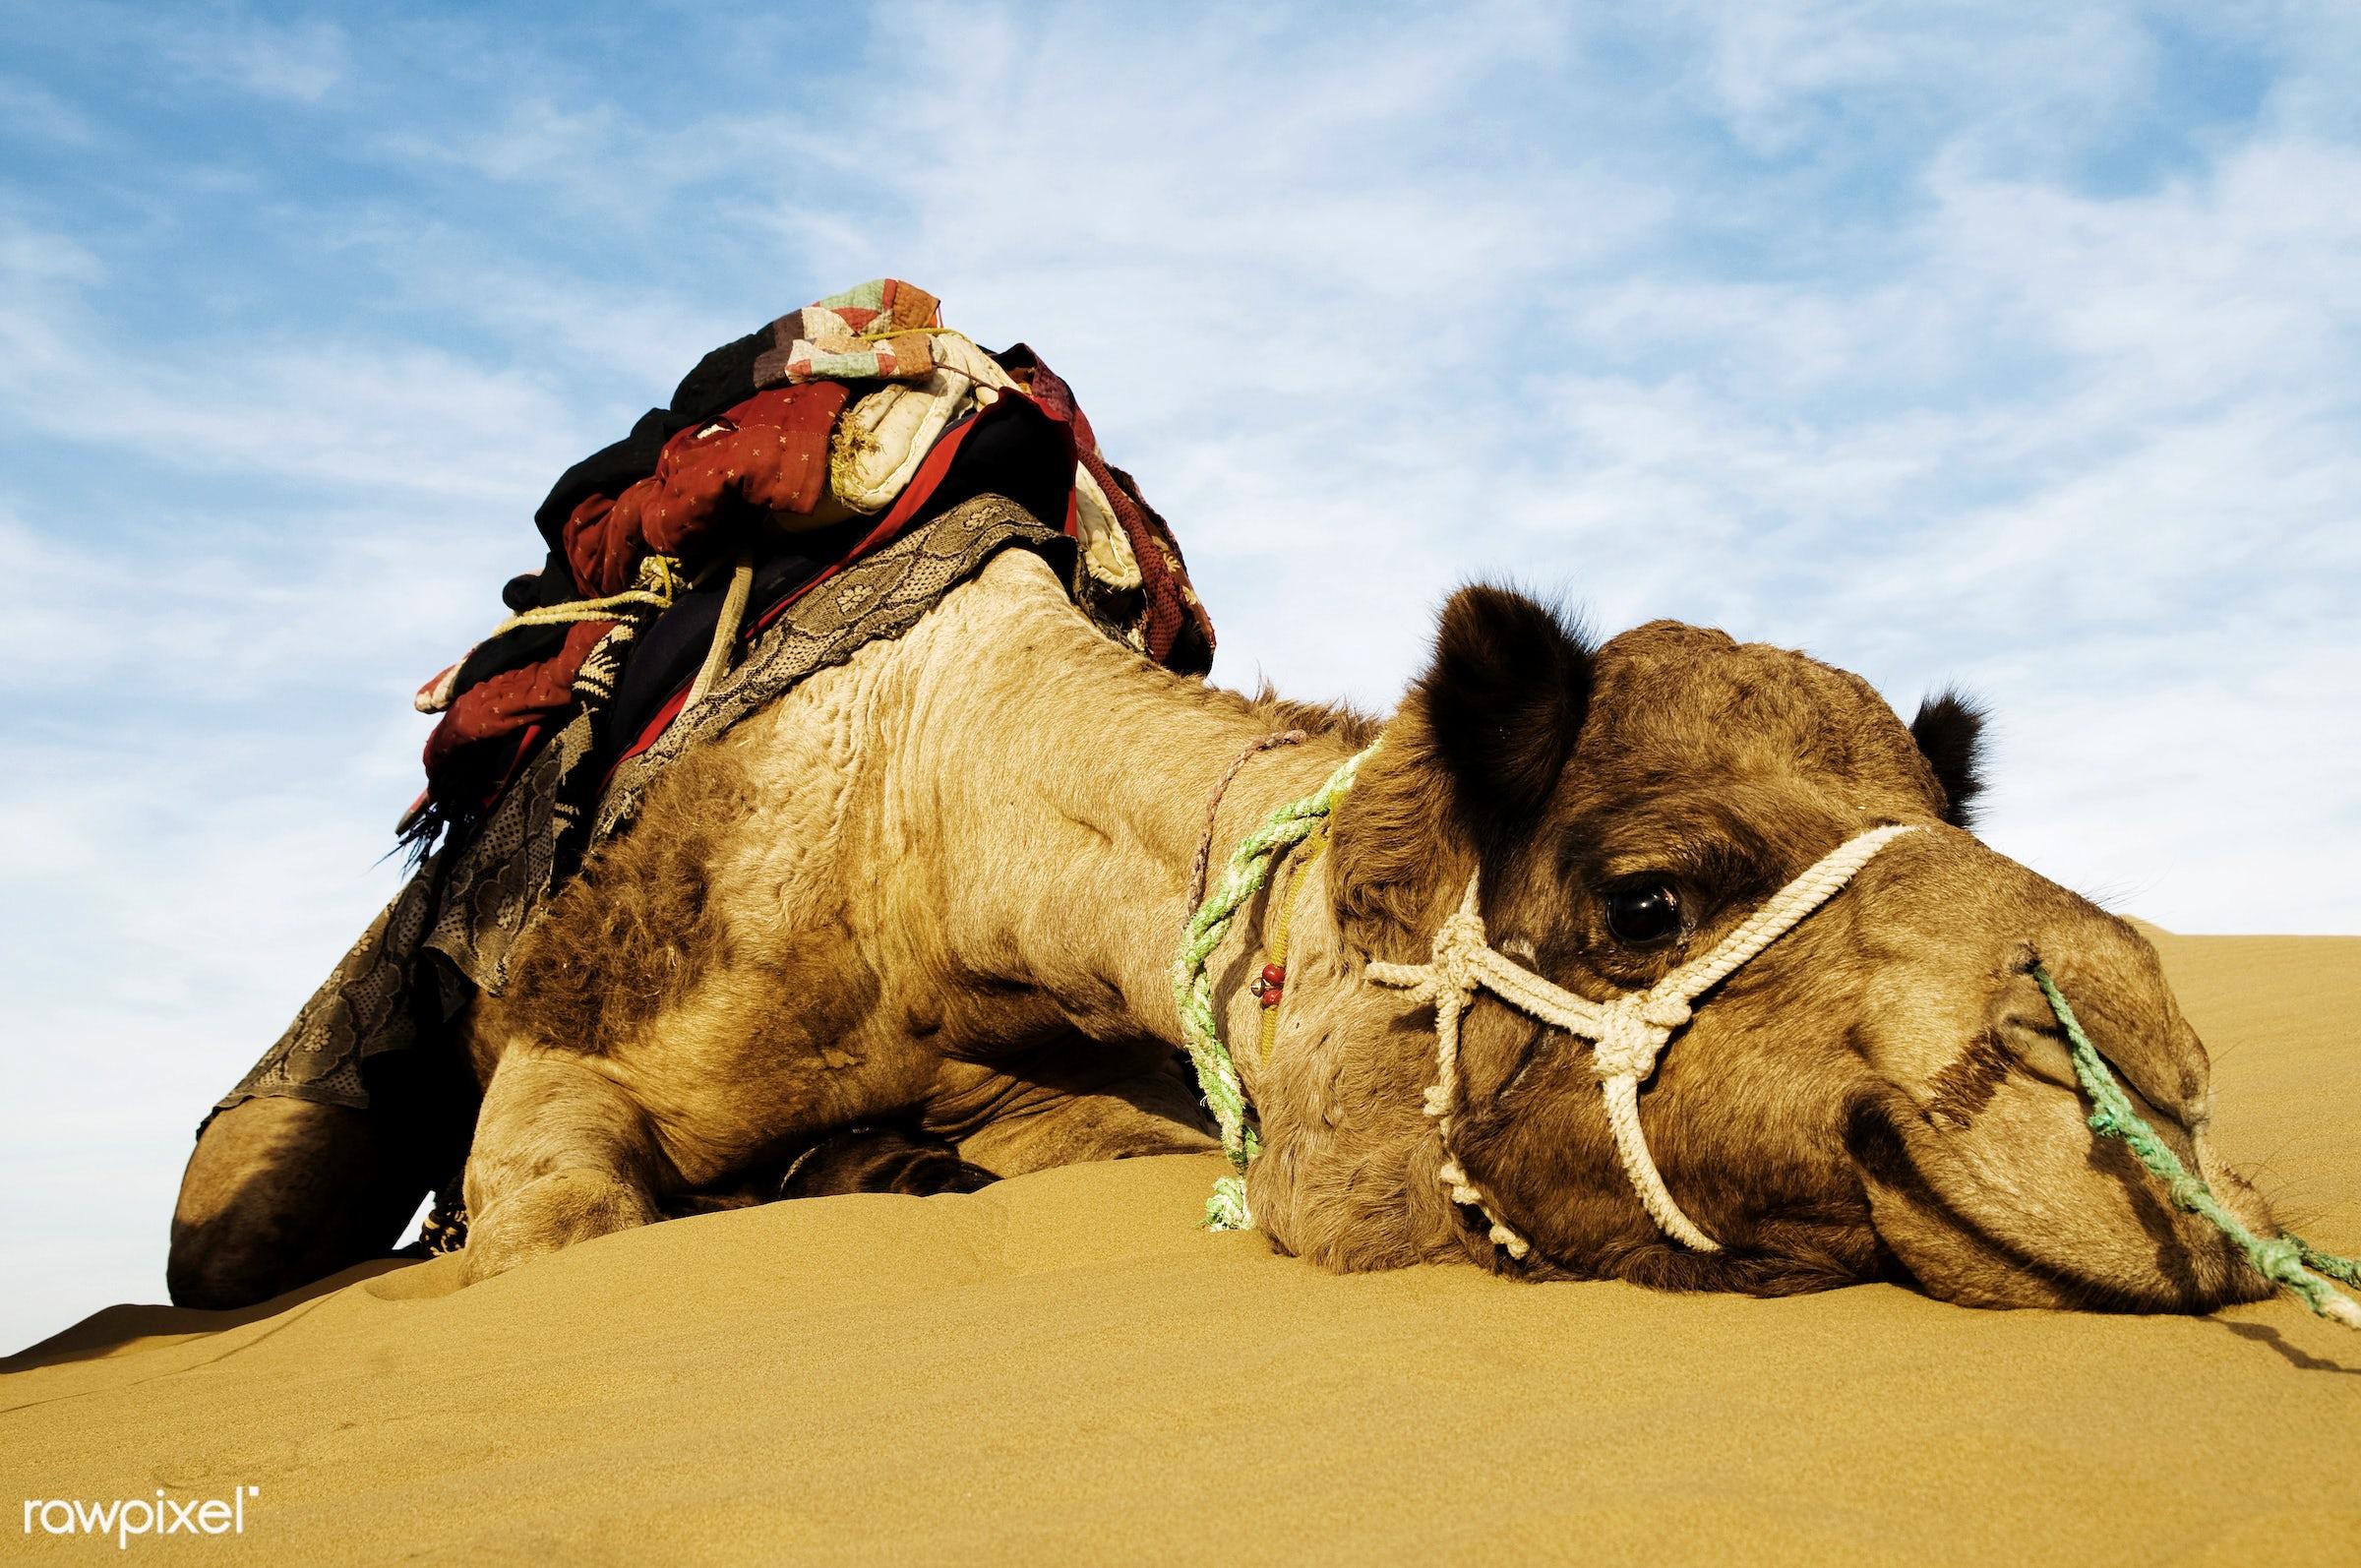 Johnnie the cutest camel. Dromedary camel in the Thar Desert, Rajasthan, India - adventure, animal, animal head, asia,...